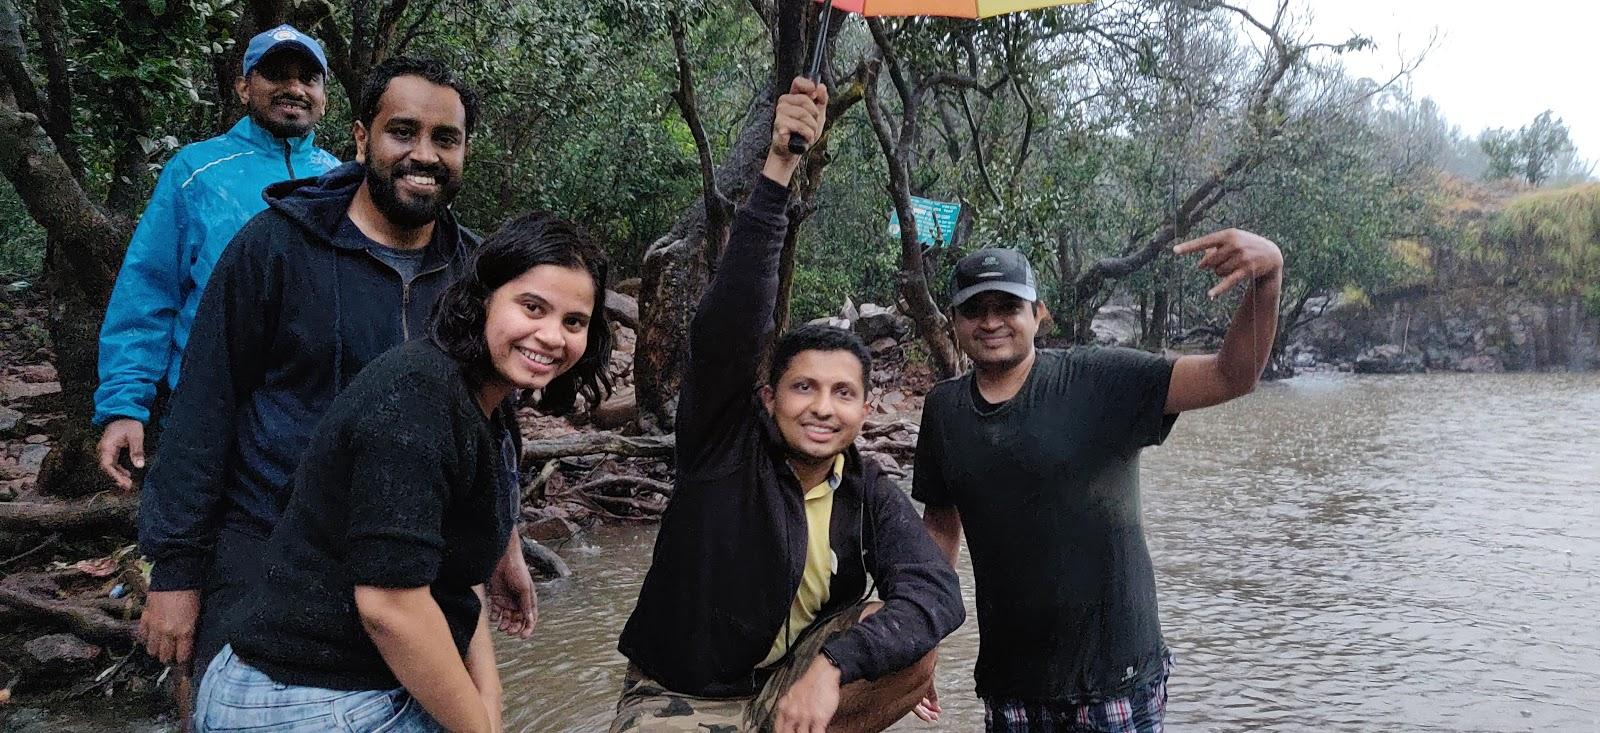 Insent team sightseeing in Mahabaleshwar